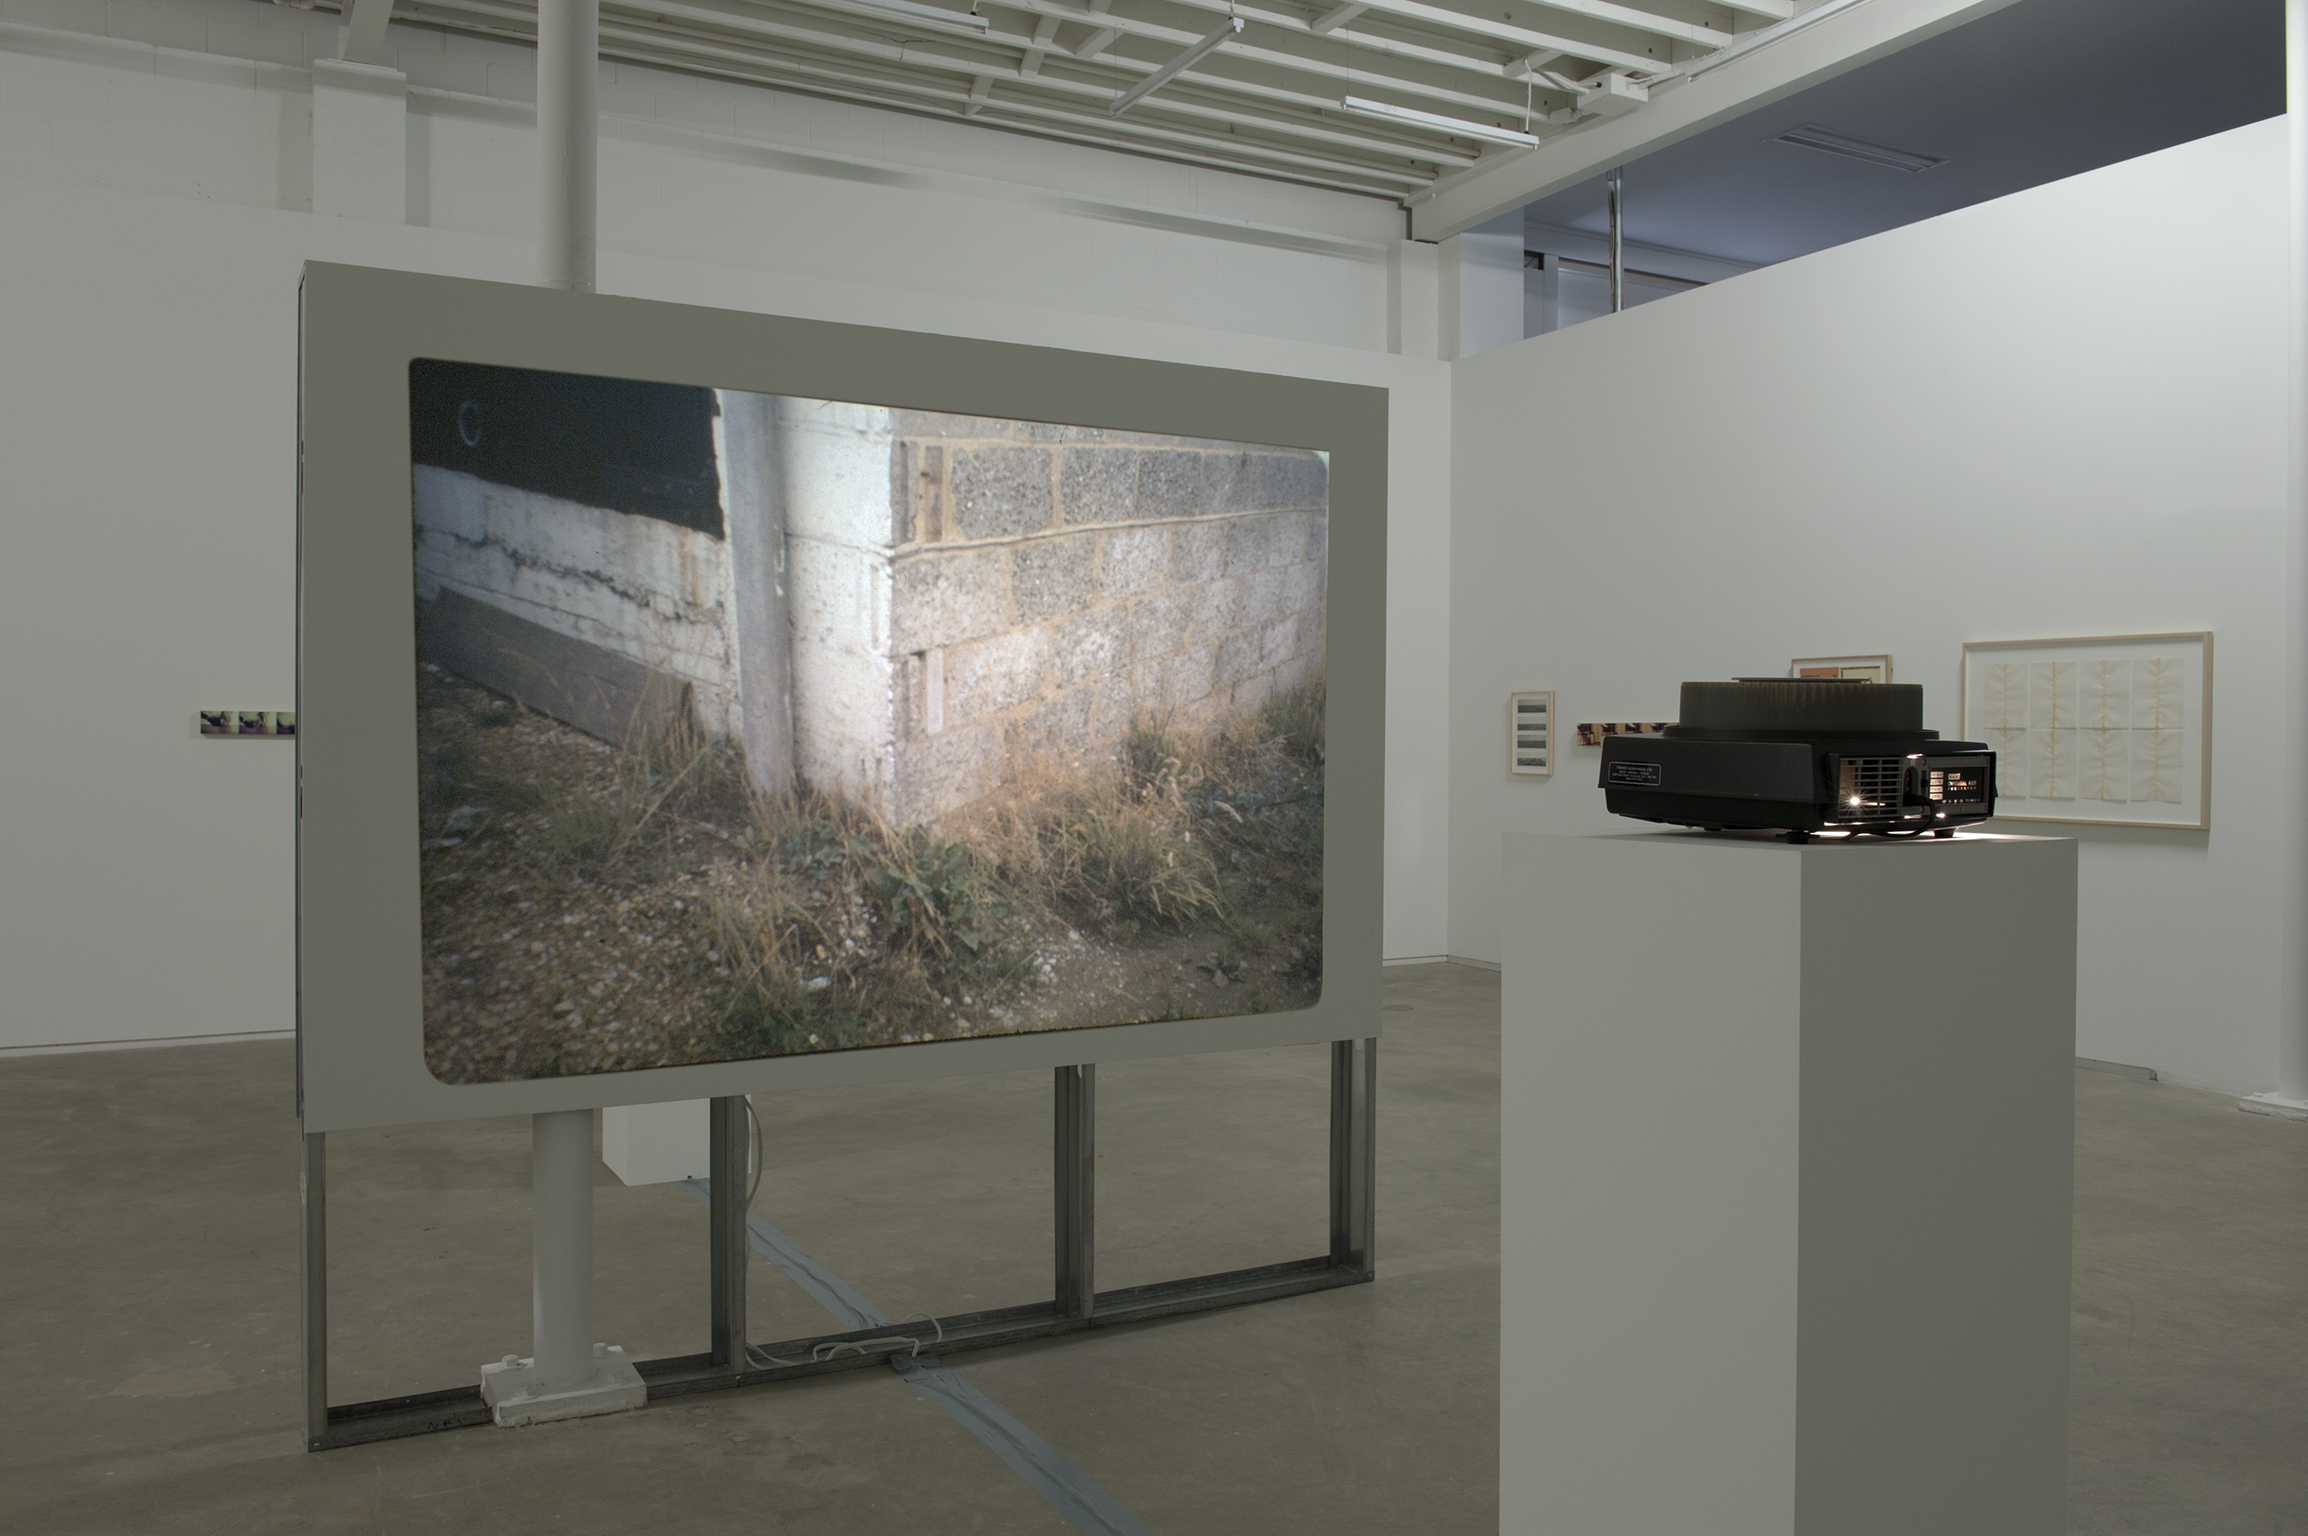 Robert Kleyn, Corners, 1973, 35mm slide projector for 80 slide carousel by